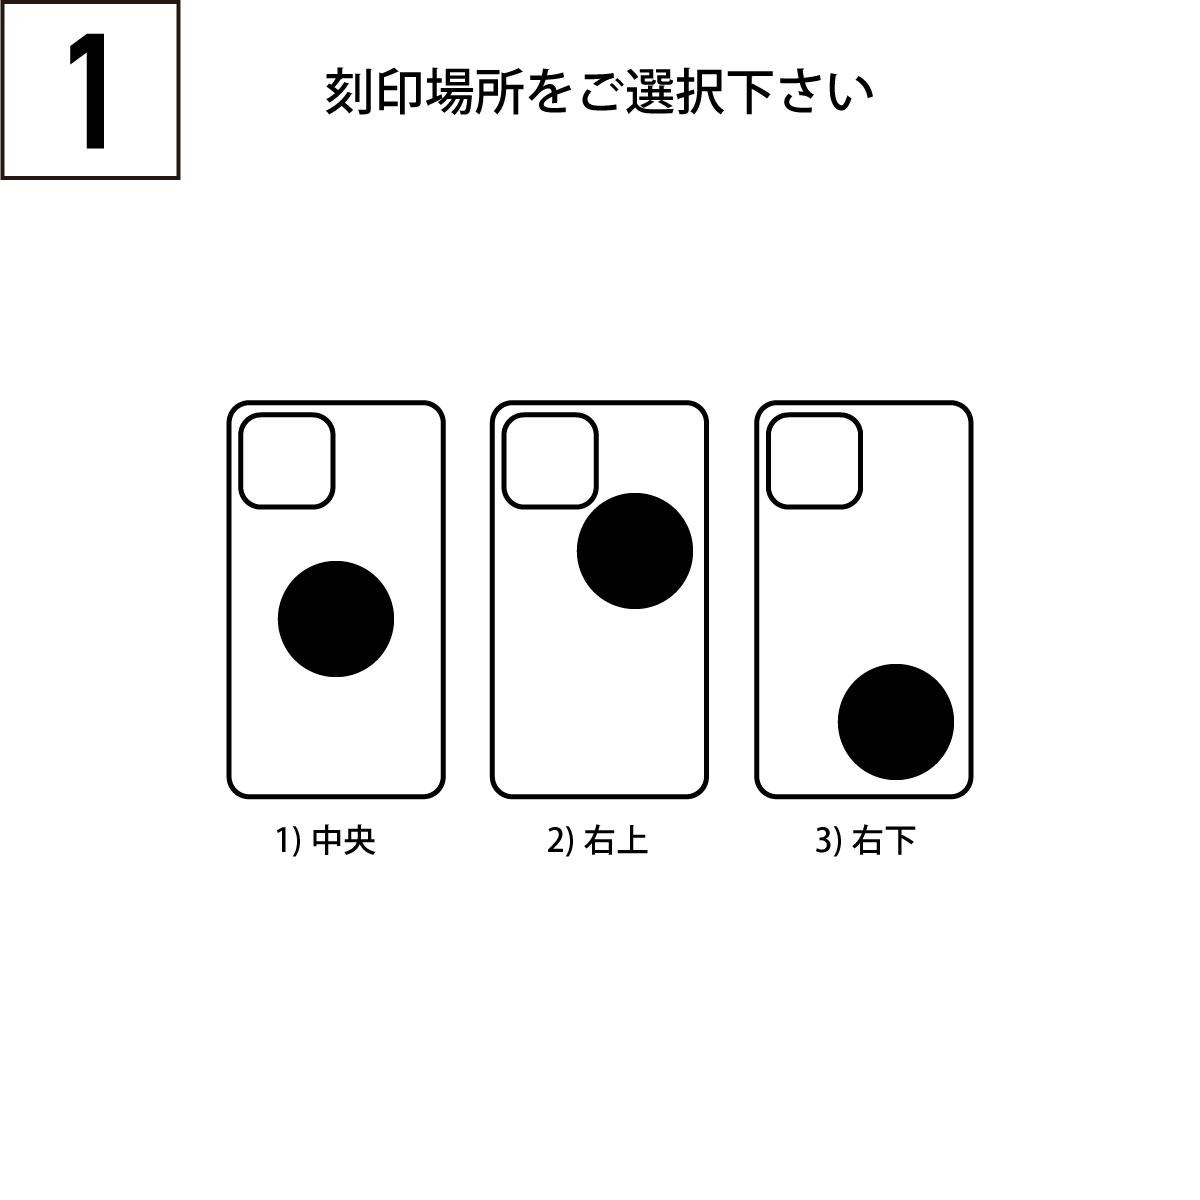 iPhoneOpenCase:    Option2:スマイル(大)刻印追加